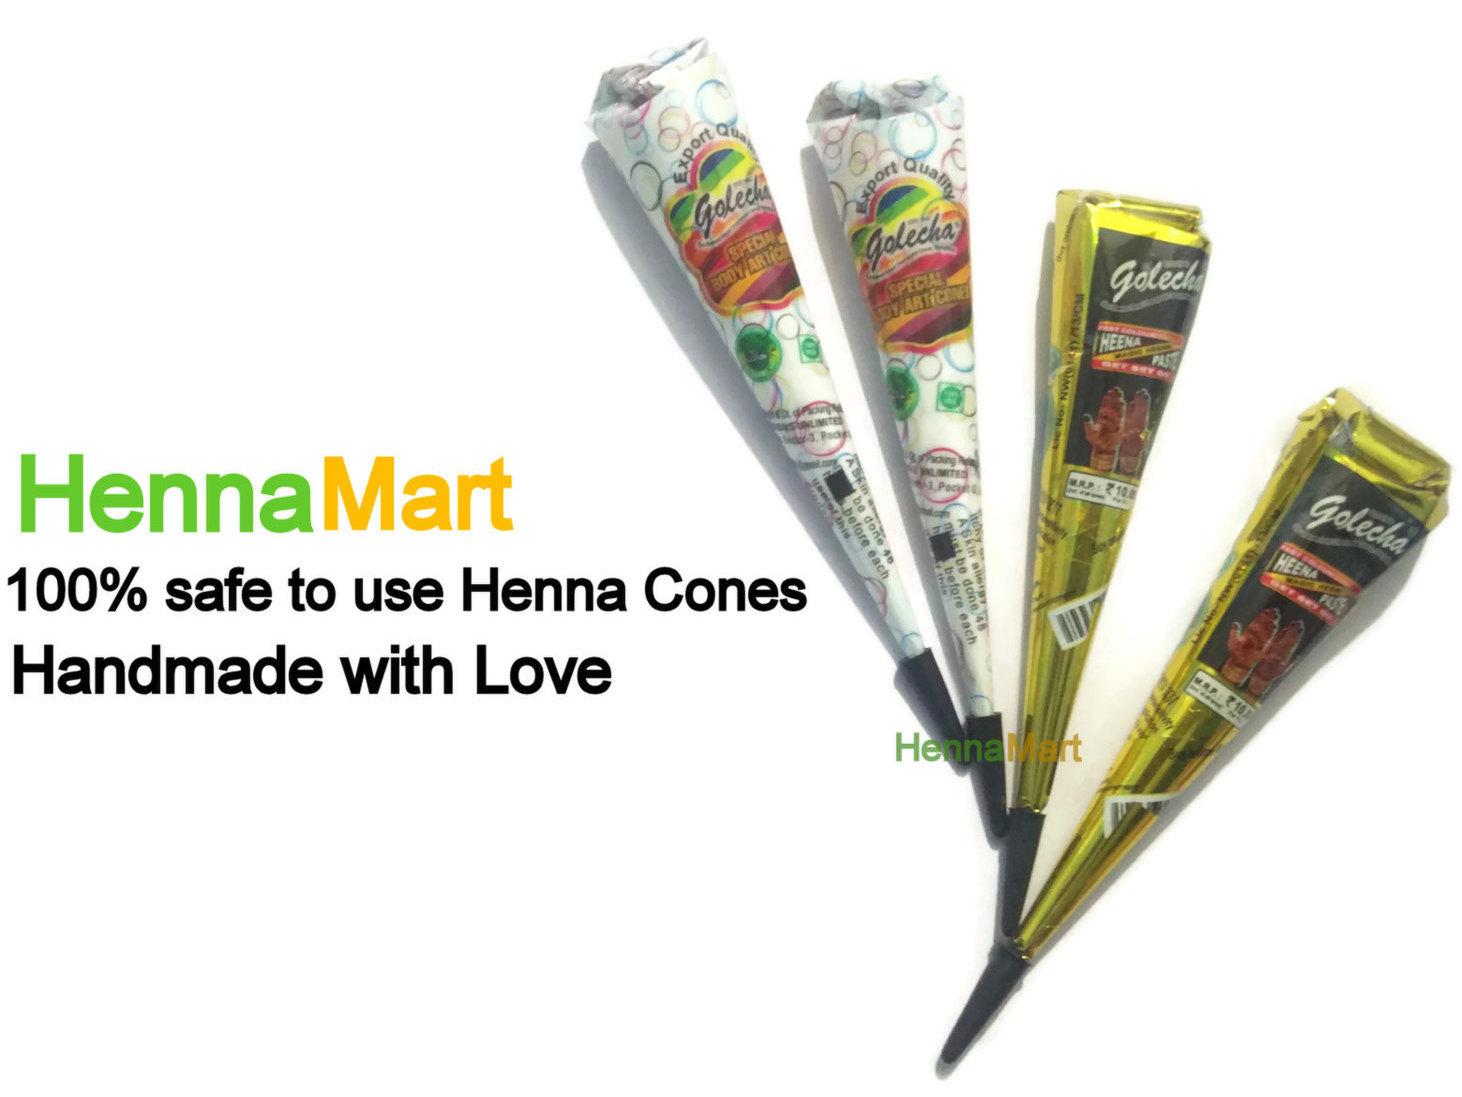 b32302f88 Il fullxfull.1117284864 lhga. Il fullxfull.1117284864 lhga. Previous. 2 White  Henna + 2 Black Henna Cones Temporary Tattoo Kit Herbal Body Art ...